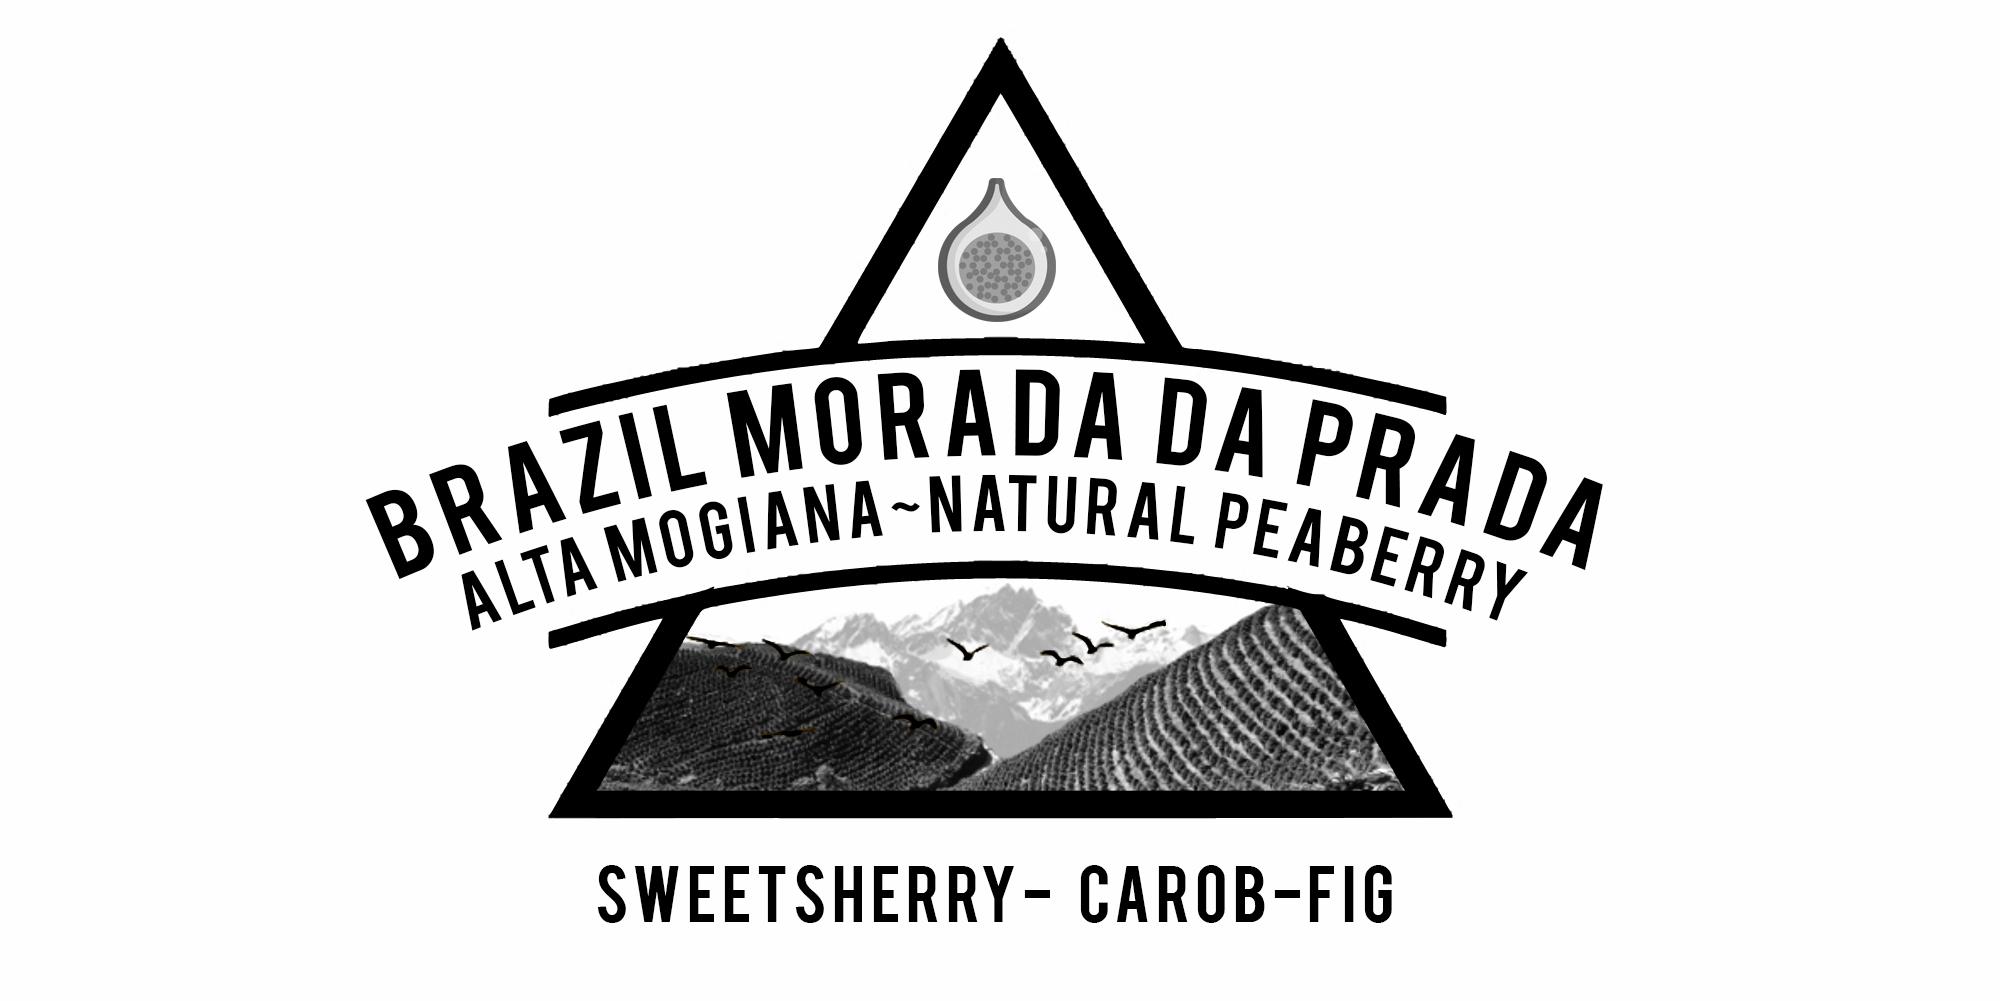 BRAZIL MORADA DA PRATA PEABERRY